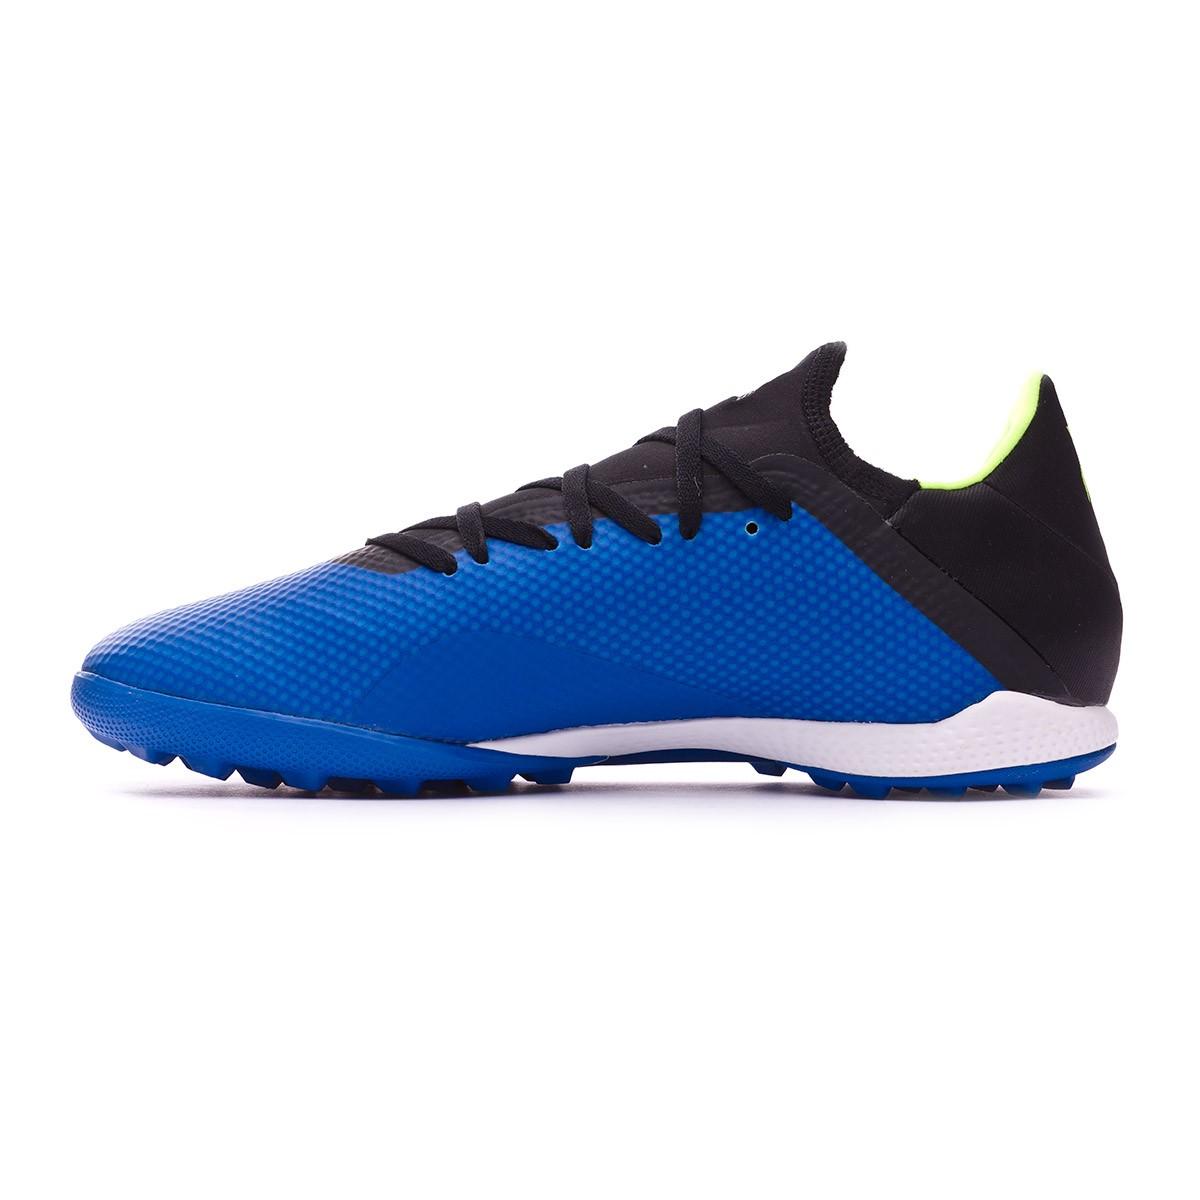 383842e99574a Football Boot adidas X Tango 18.3 Turf Foot blue-Solar yellow-Black -  Football store Fútbol Emotion